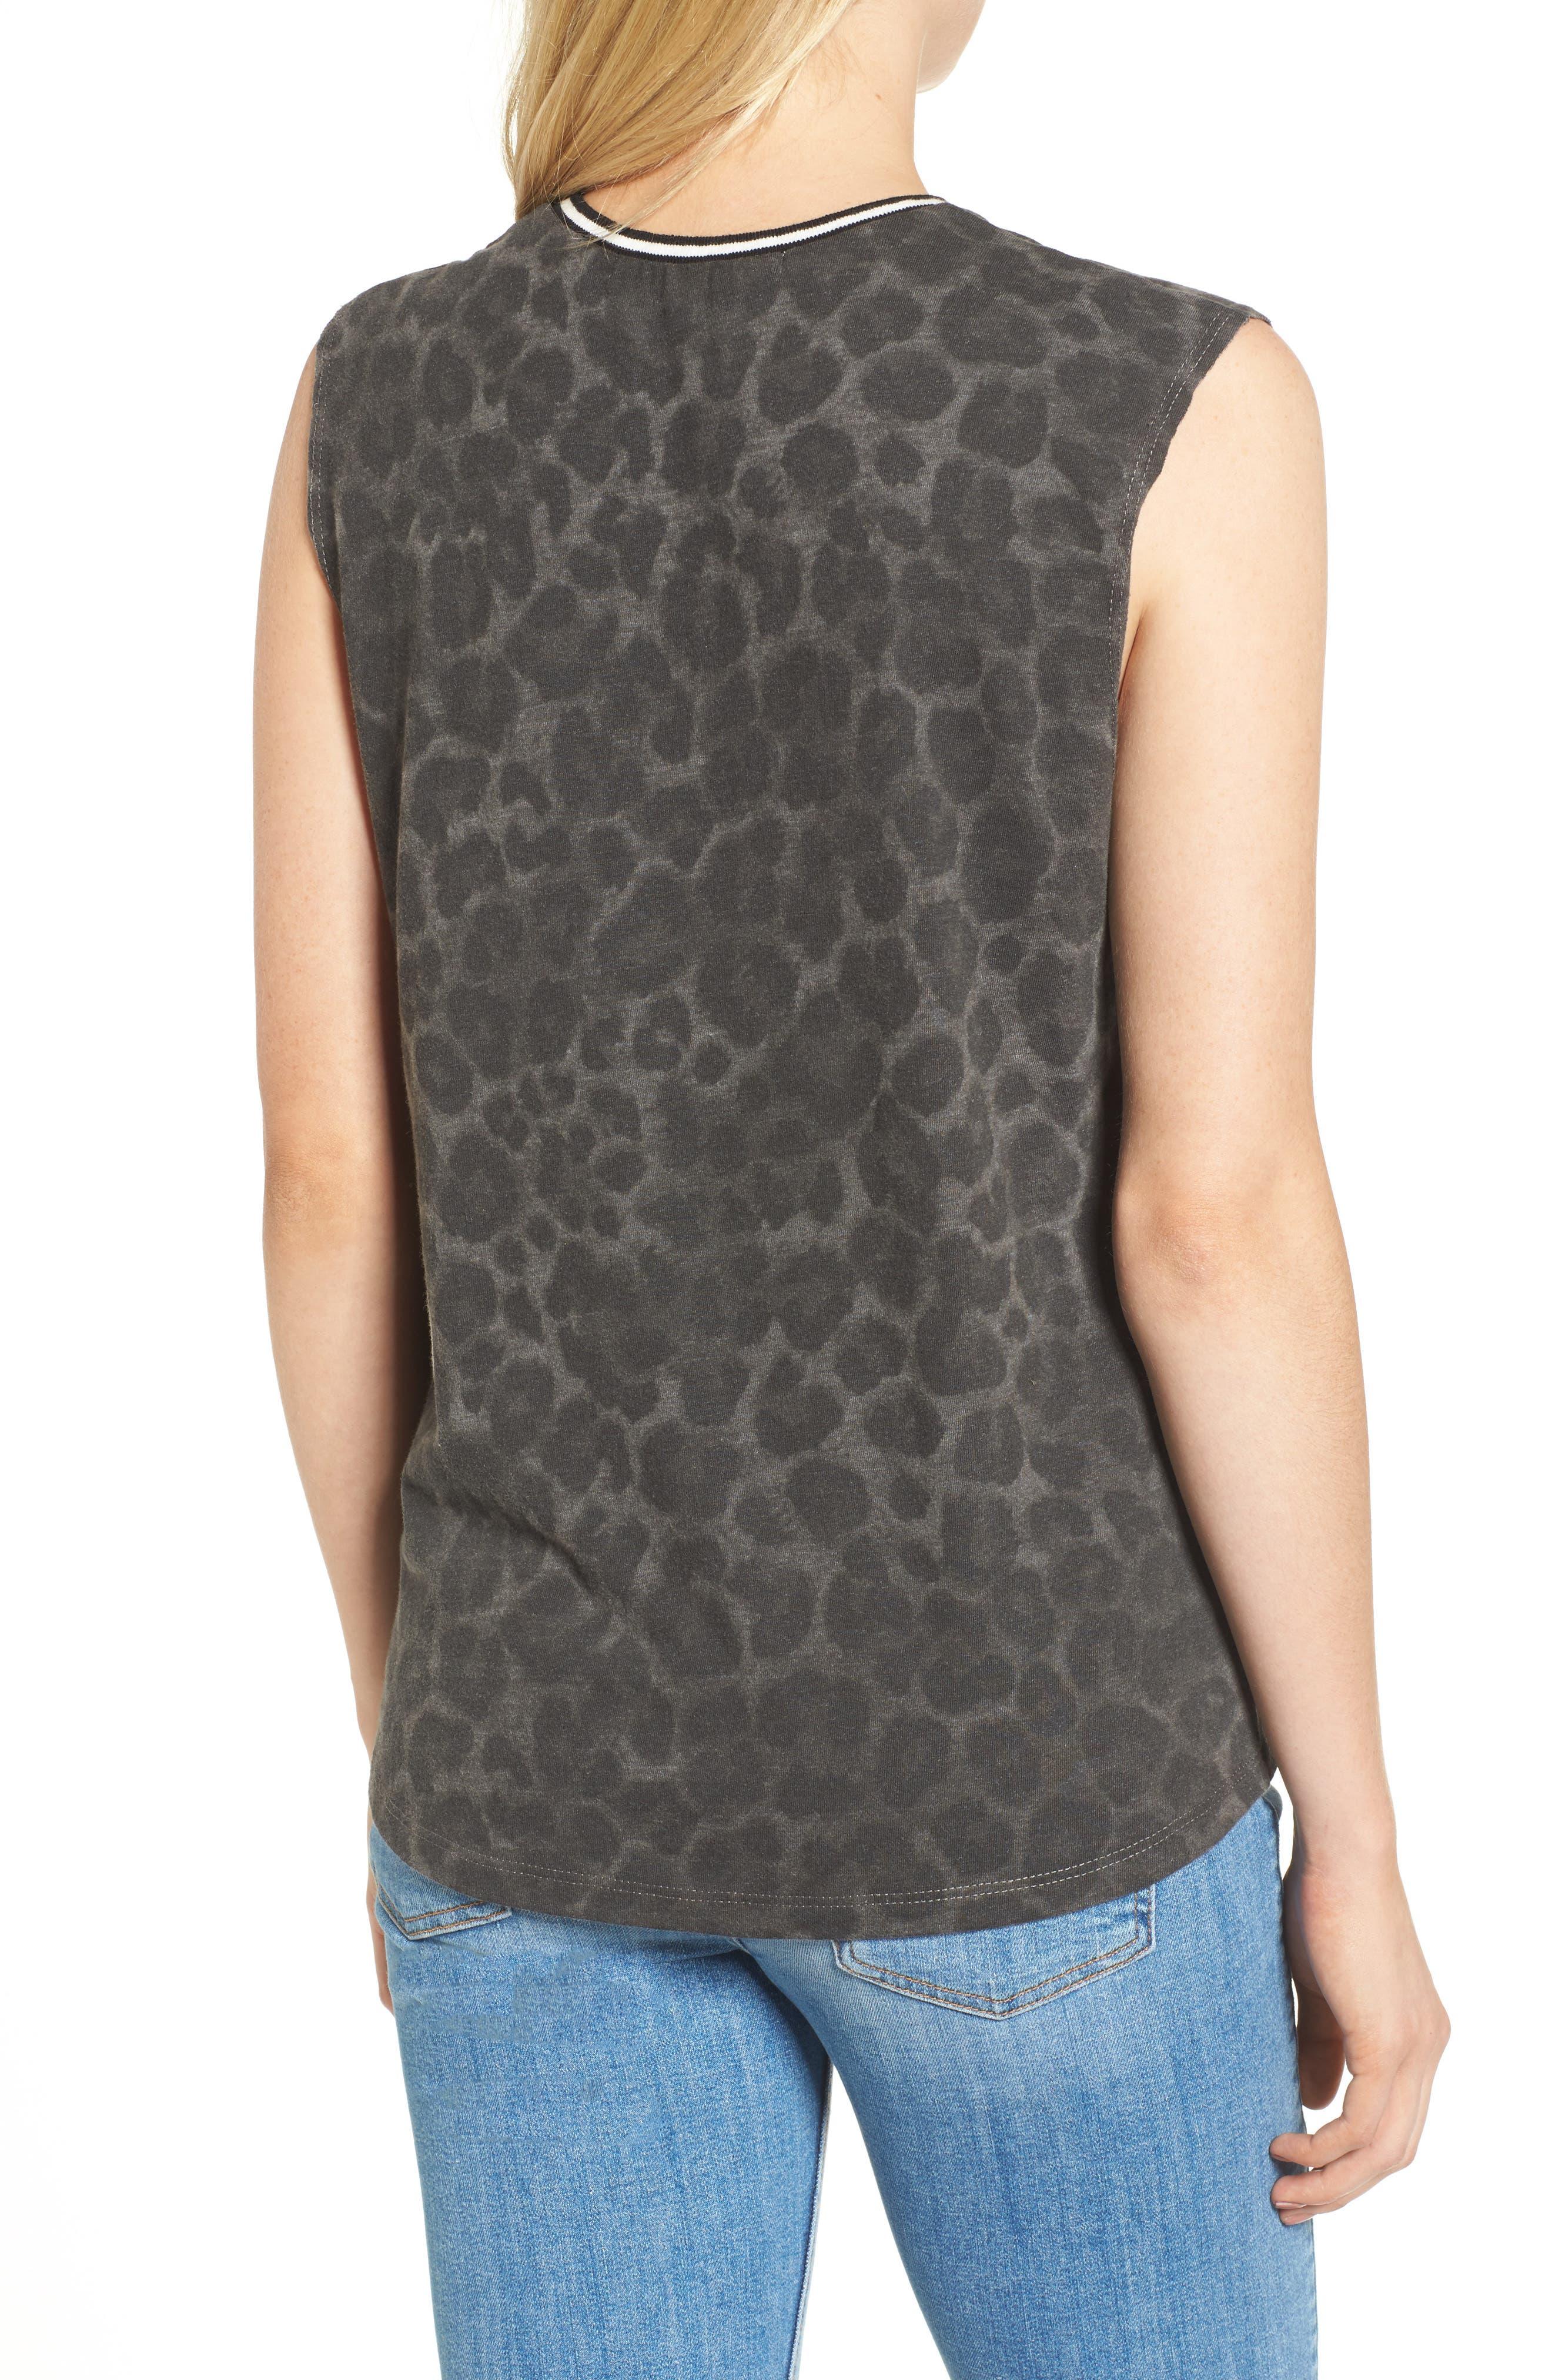 Choker Top,                             Alternate thumbnail 2, color,                             Leopard Print